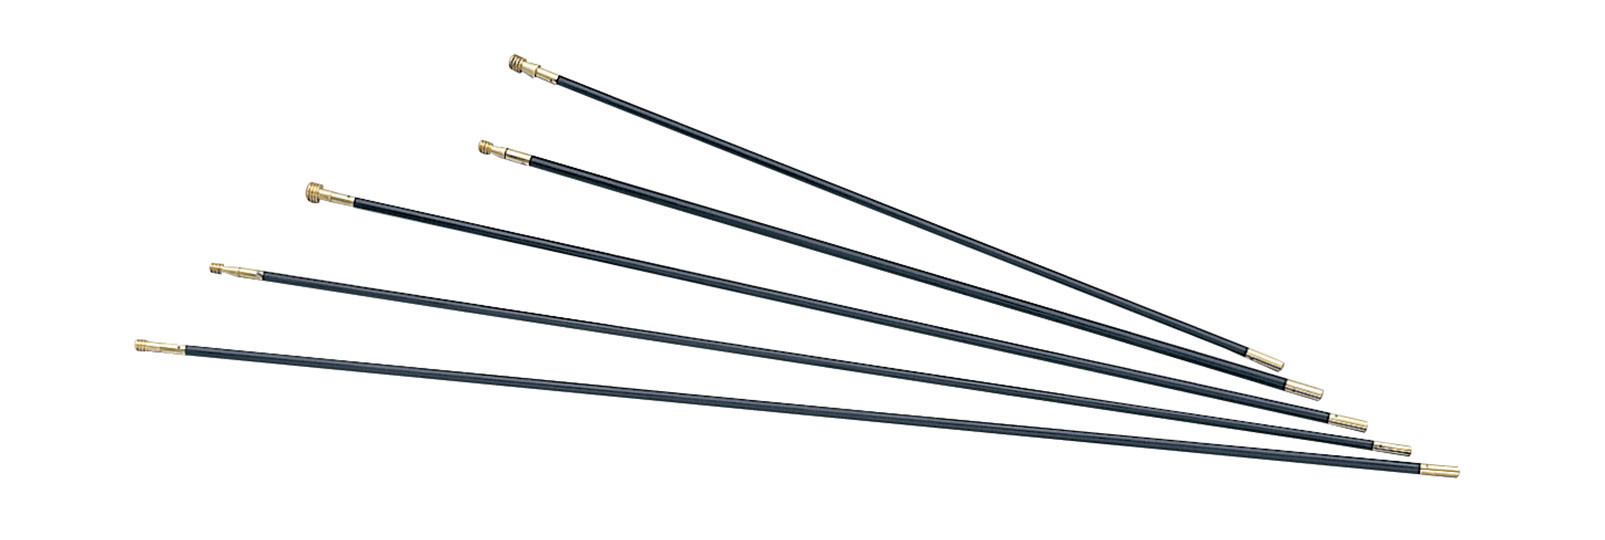 Bacchetta/fiber rod 9x700mm